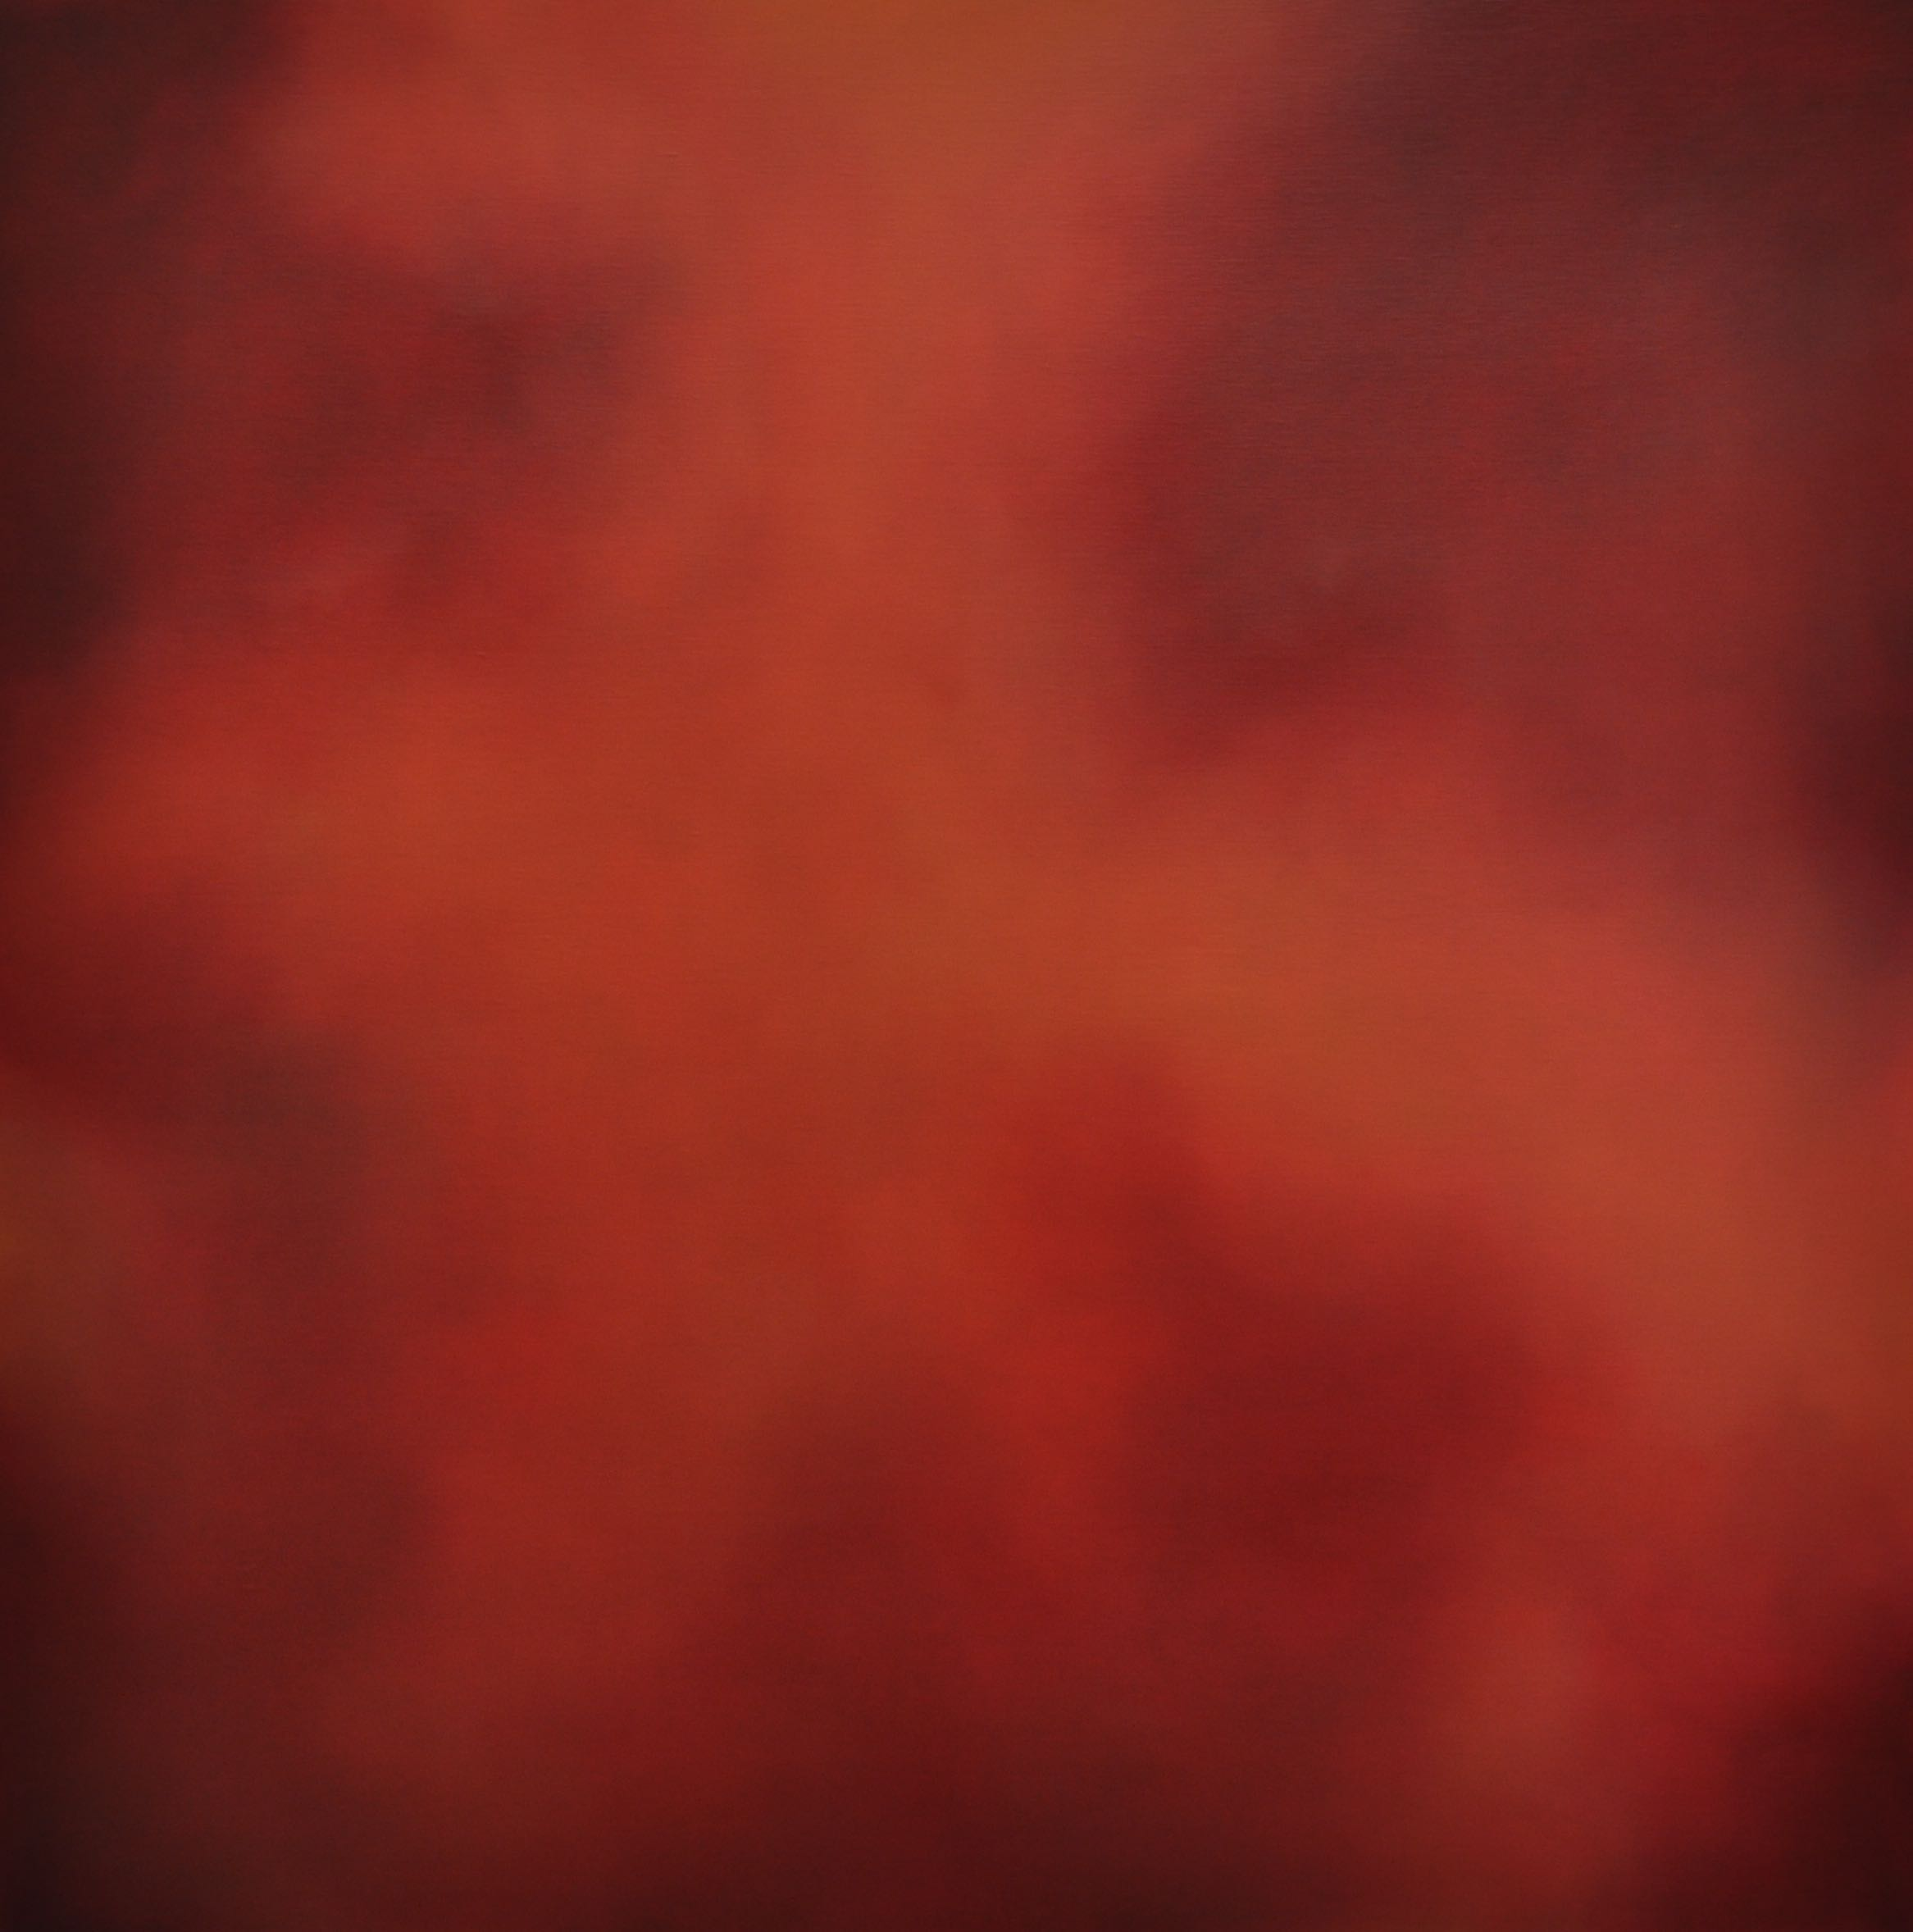 Red into Orange 120x120cm Oil on Linen 2008